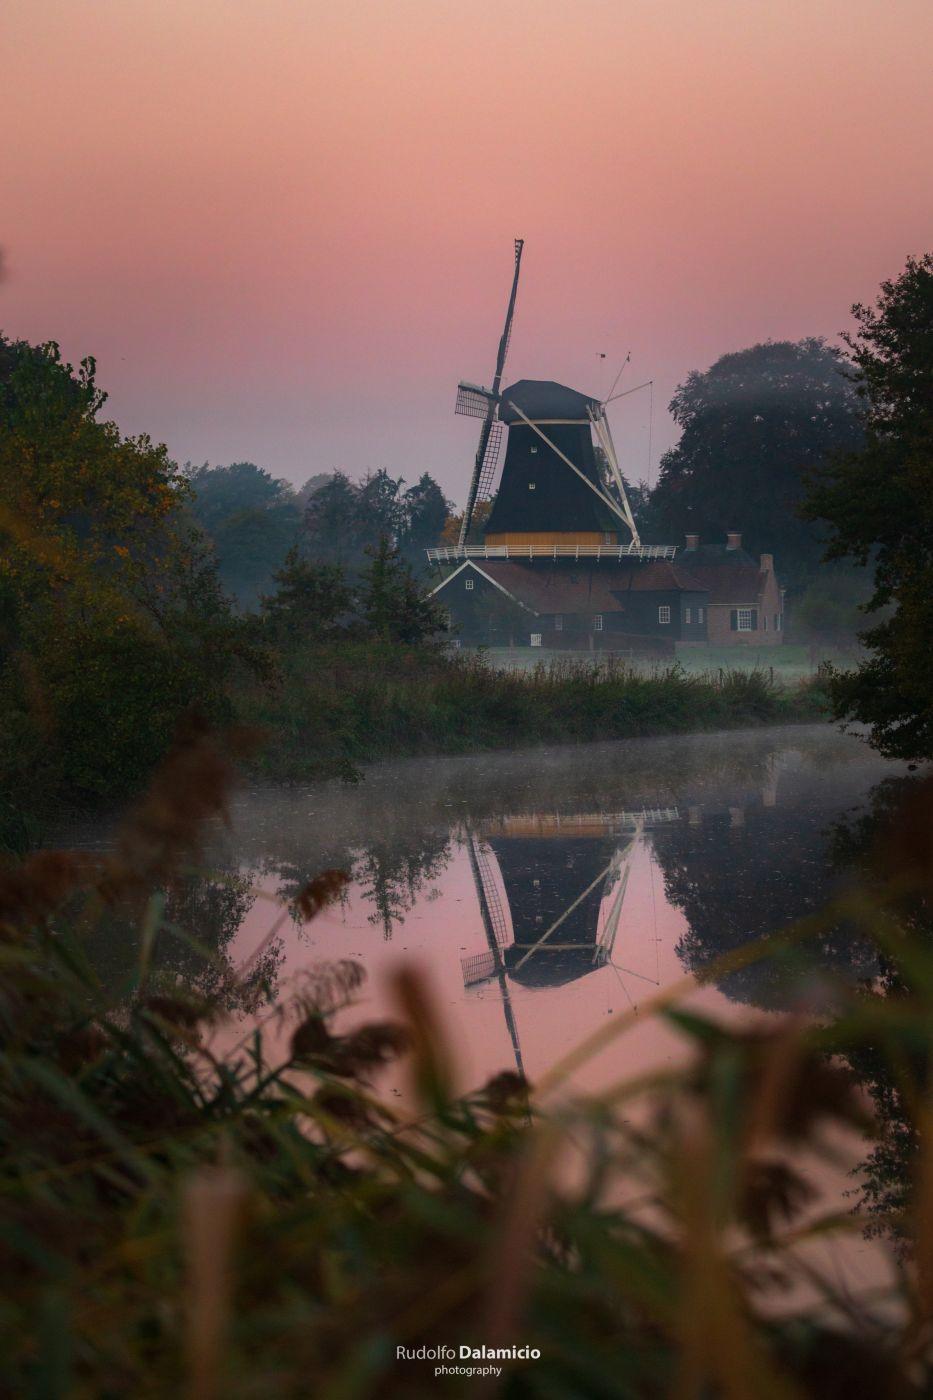 Pelmolen nr1, Netherlands